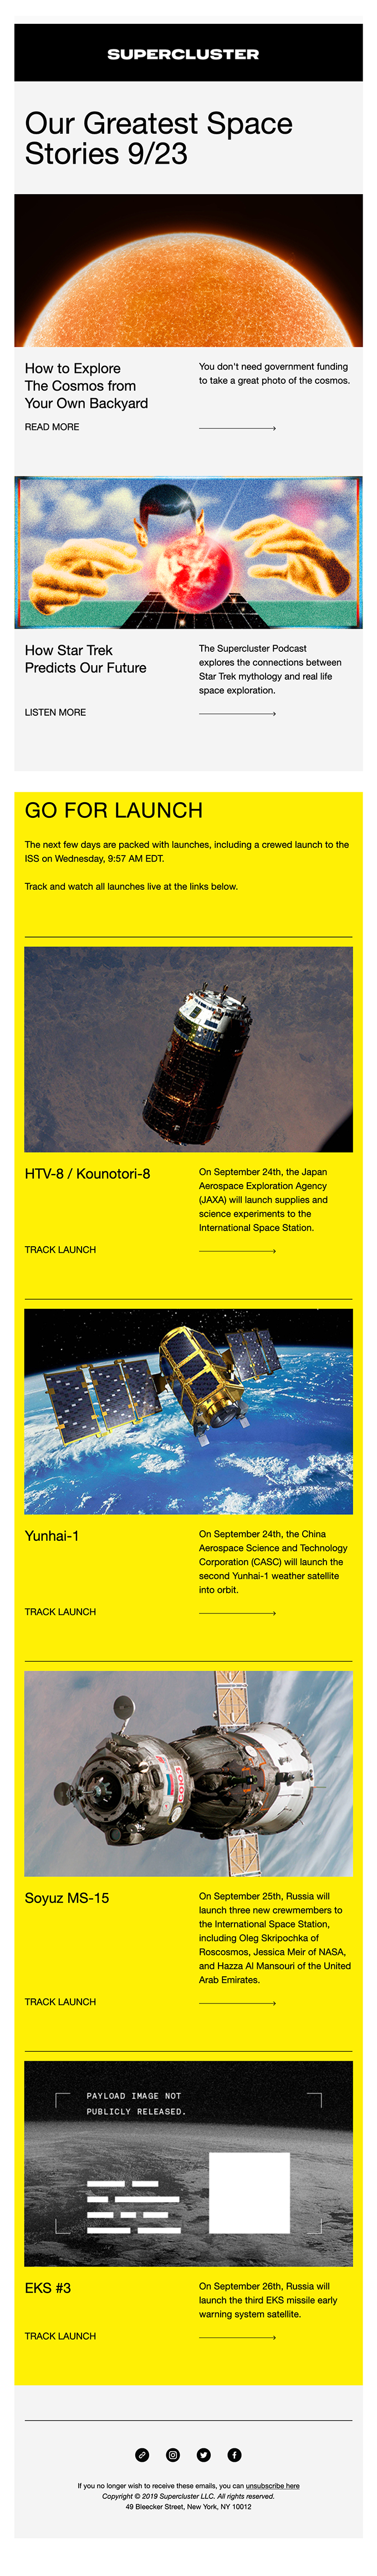 The Supercluster Newsletter 9.23.19